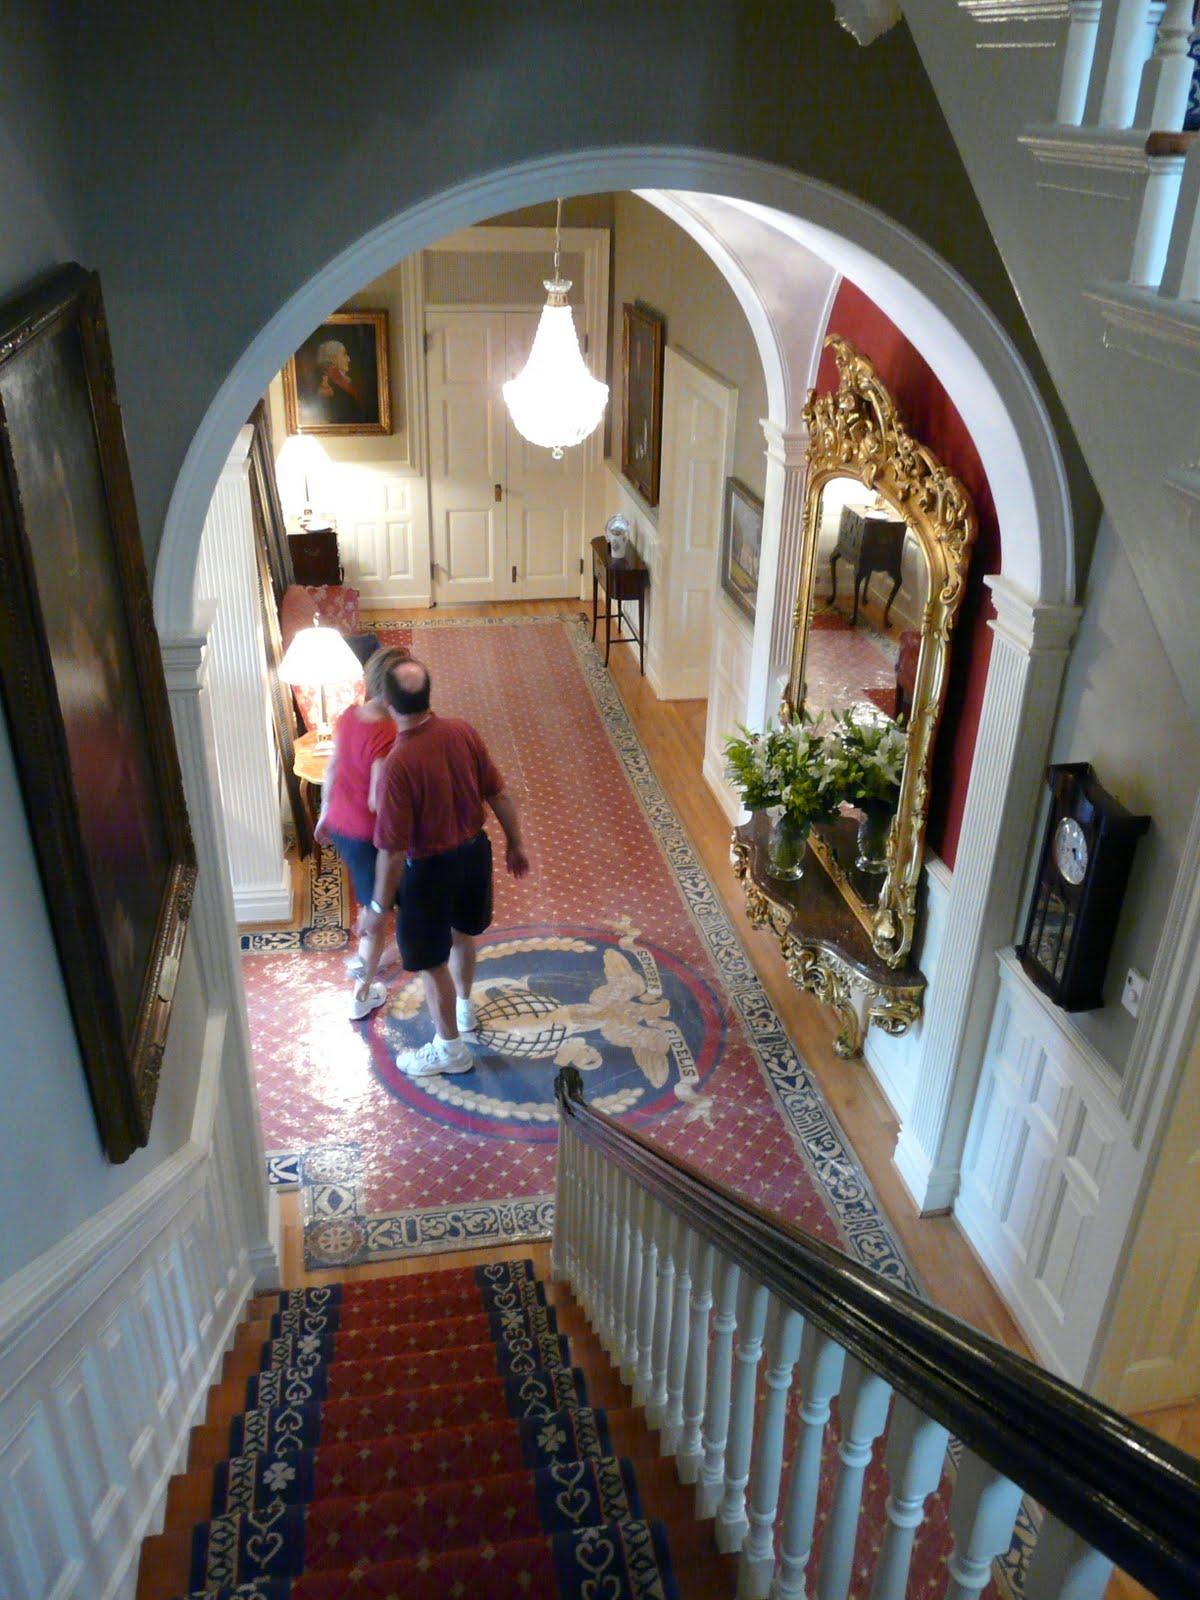 Tuxedomoon Tour of the Marine Commandants Home